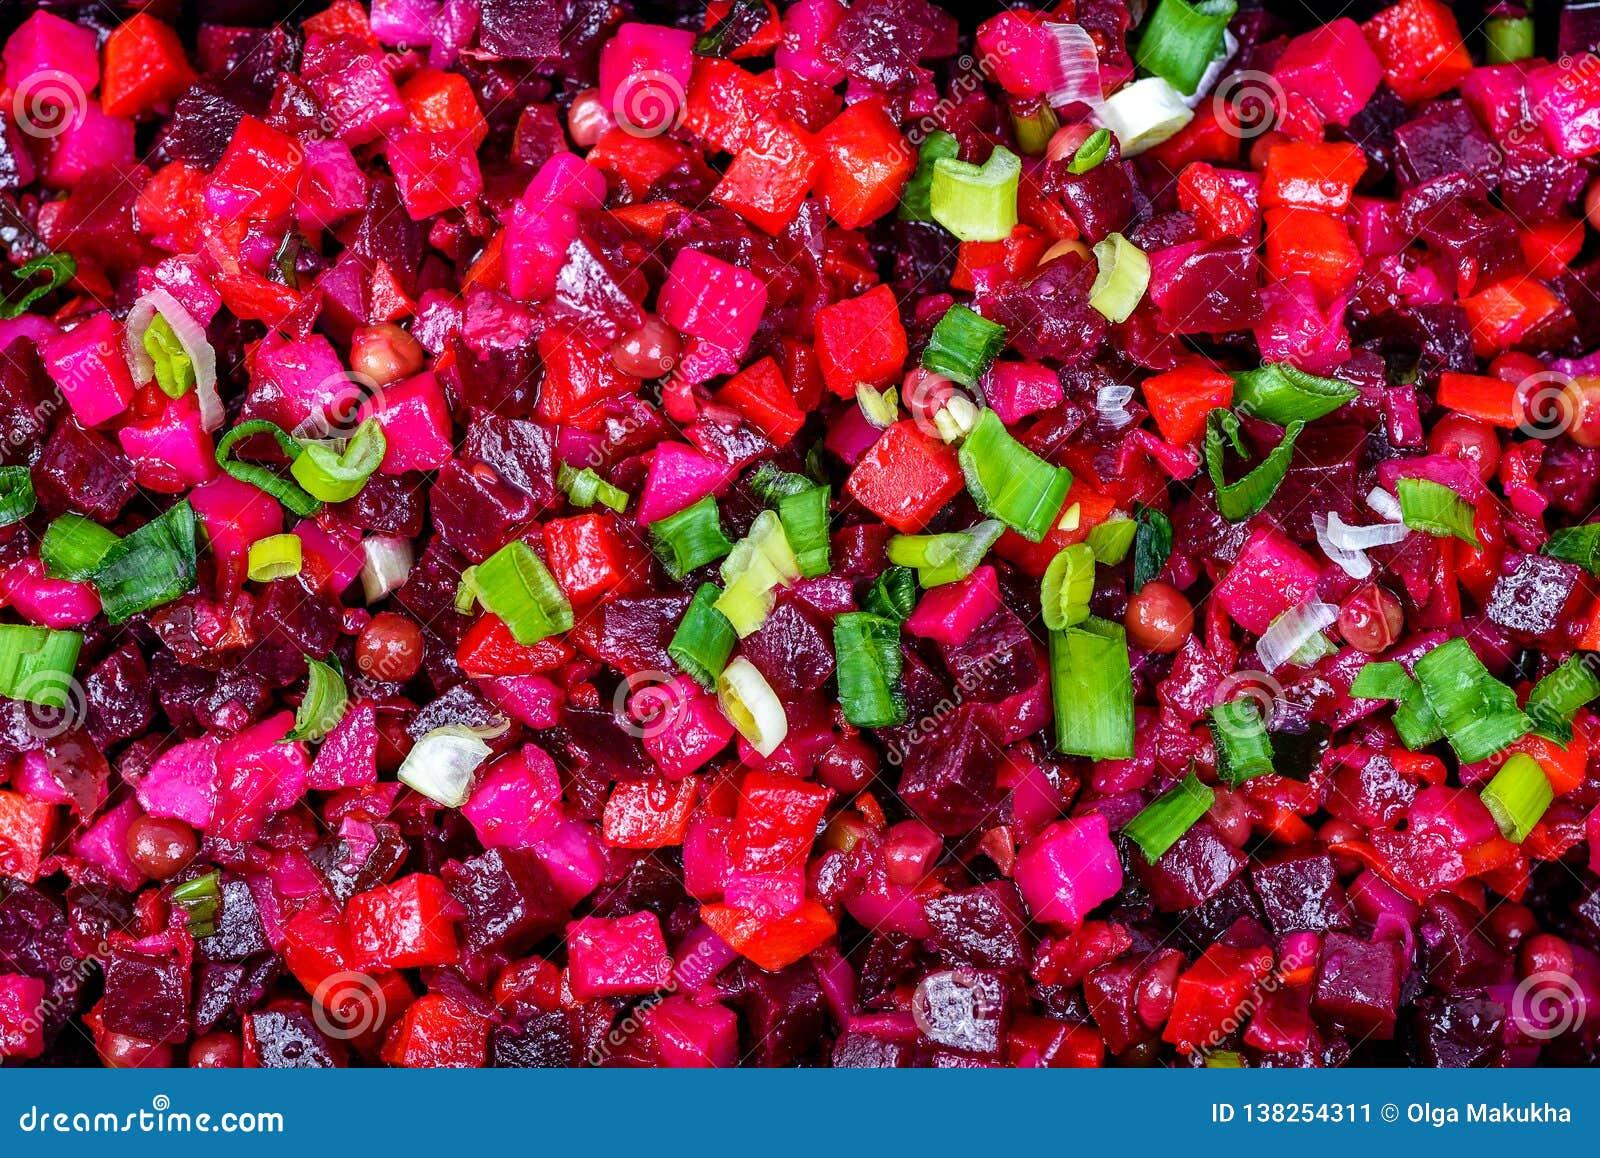 Beet red salad vinaigrette russian traditional food